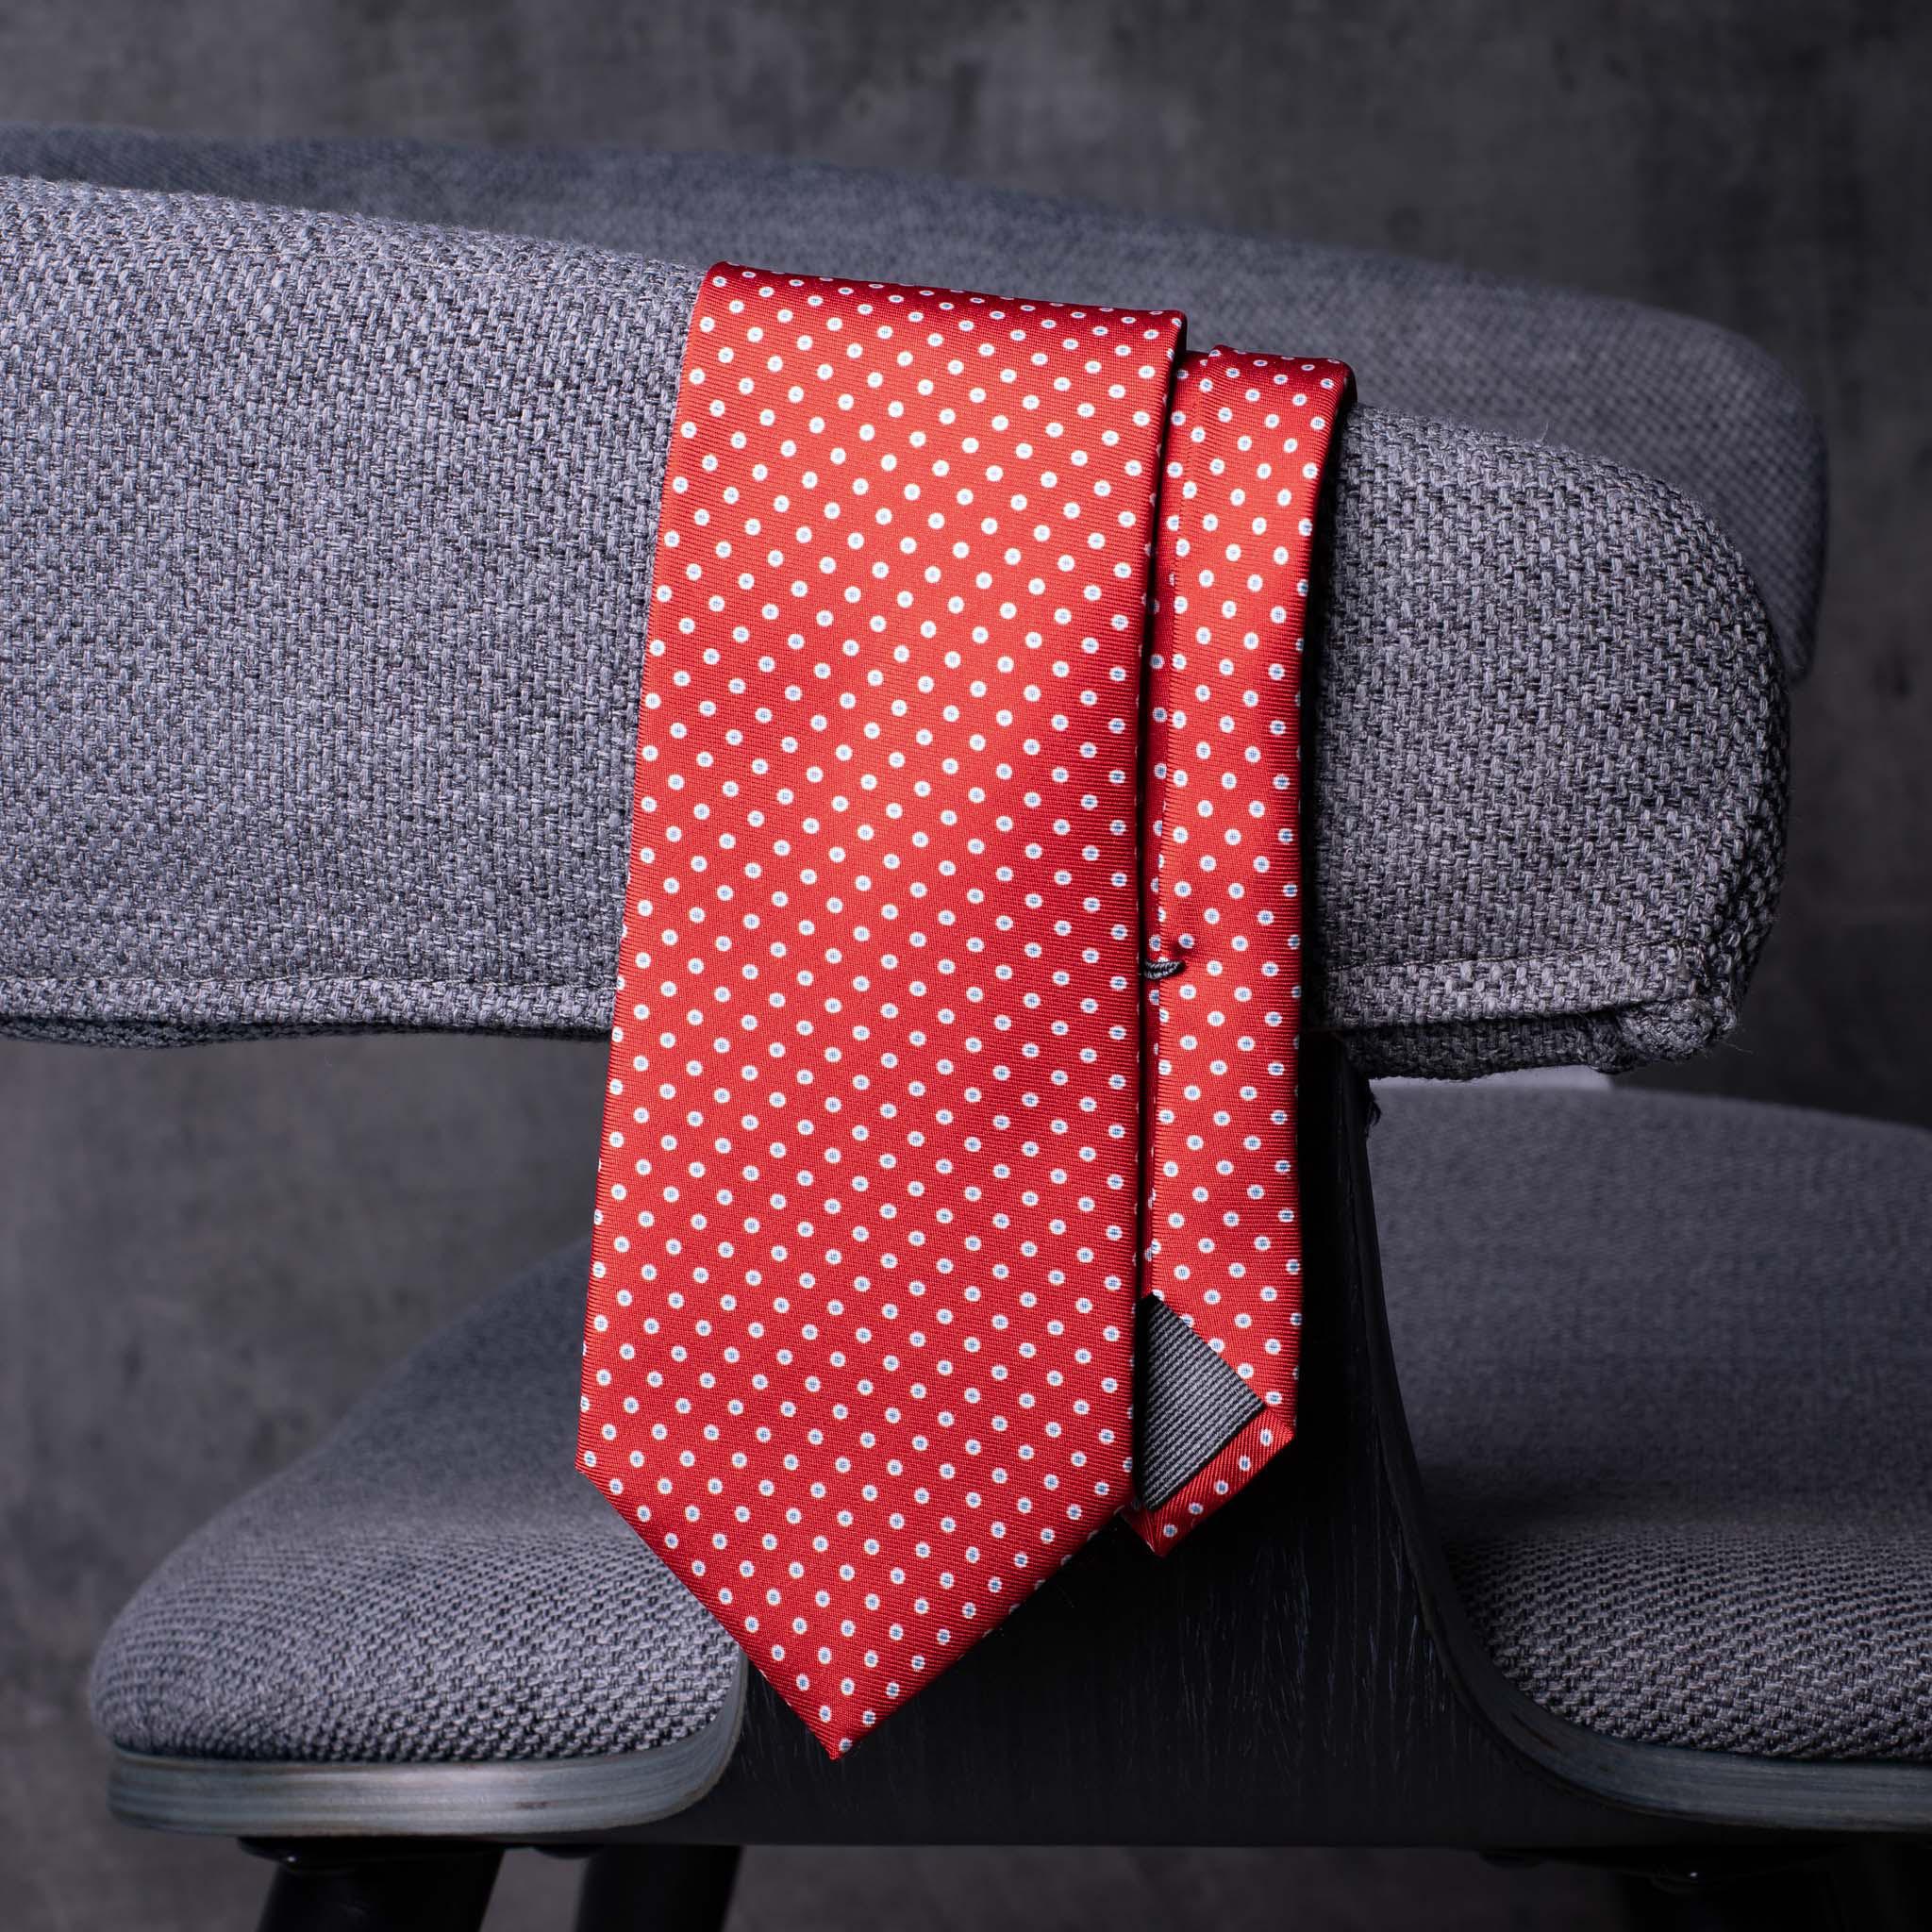 PRINTED SILK-0479-Tie-Initials-Corbata-Iniciales-The-Seelk-3